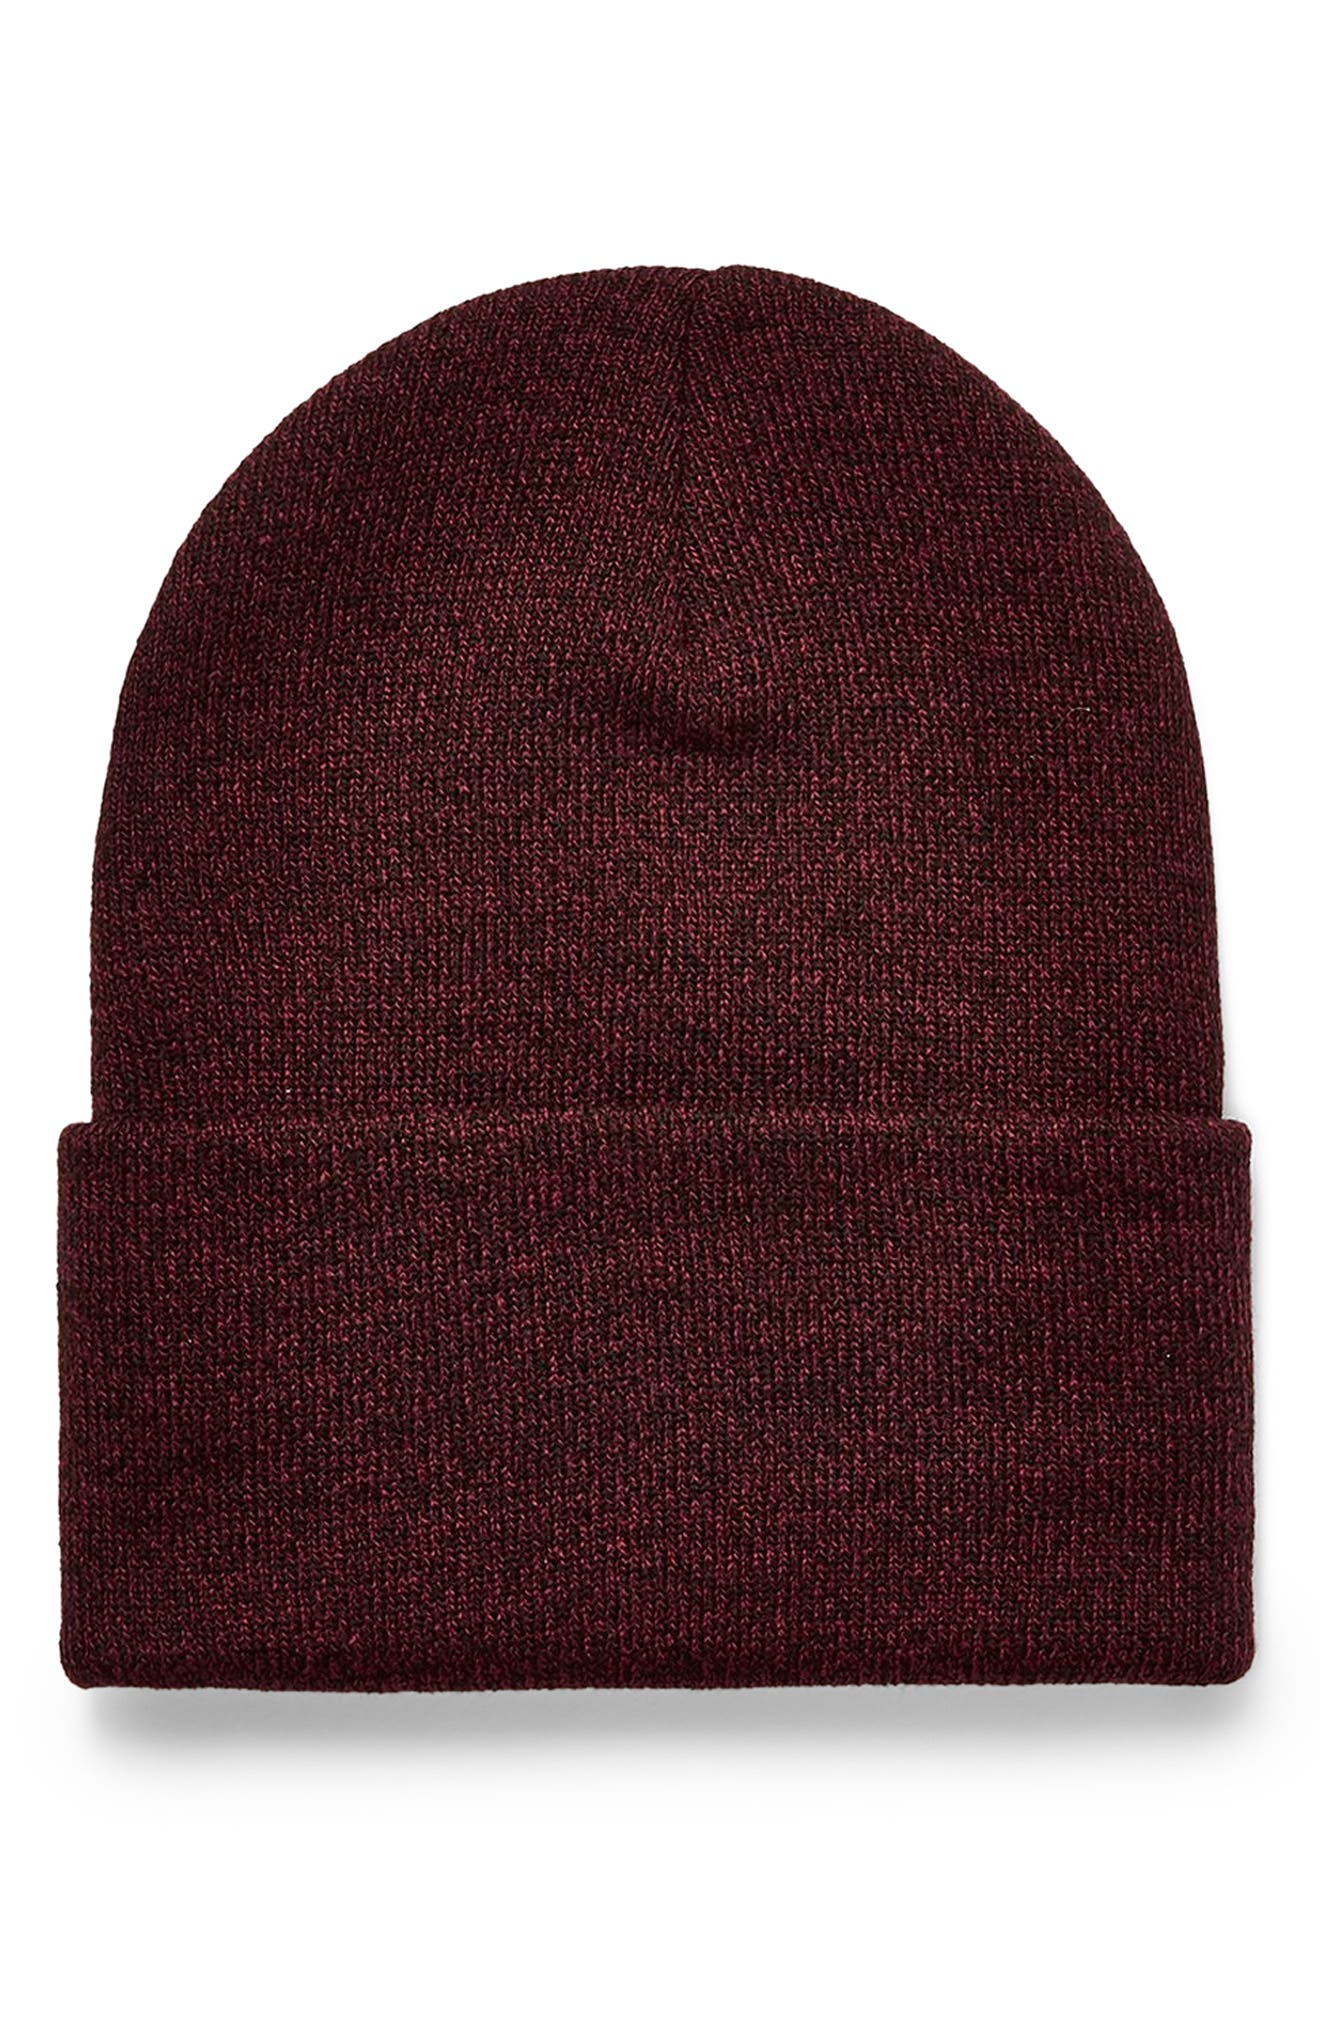 Knit Beanie,                         Main,                         color, 930